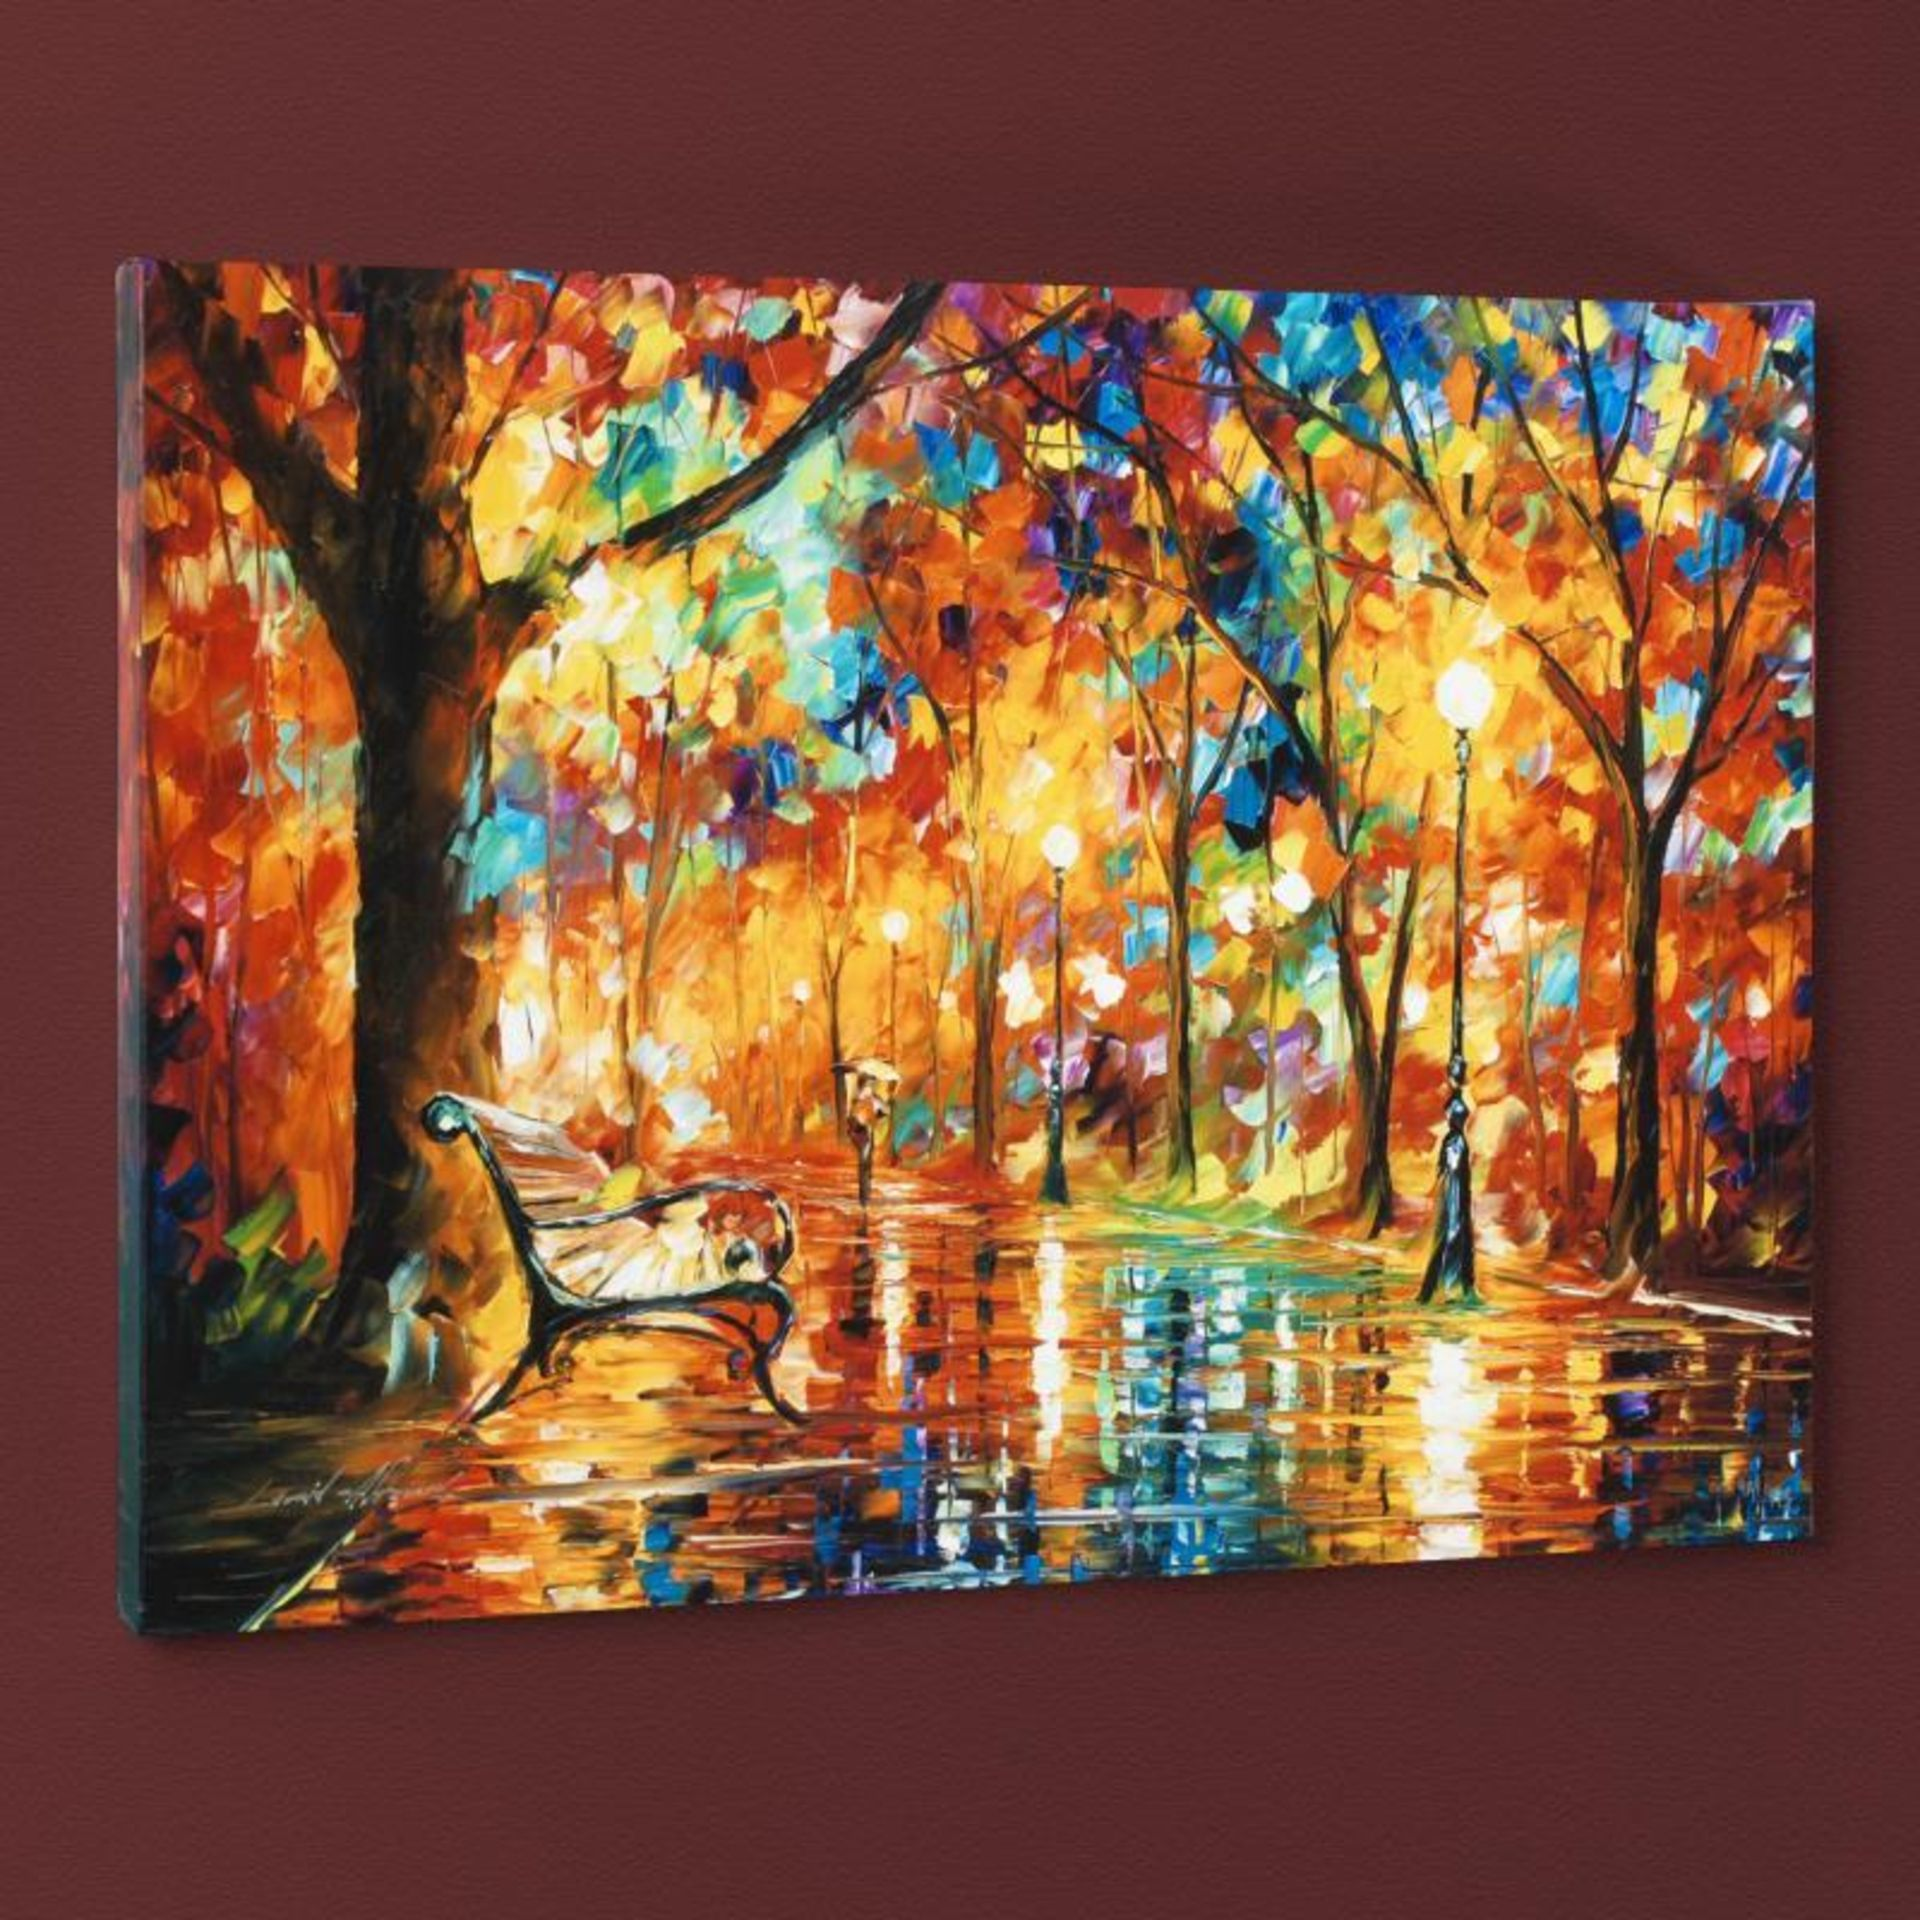 "Leonid Afremov (1955-2019) ""Burst of Autumn"" Limited Edition Giclee on Canvas, N - Image 3 of 3"